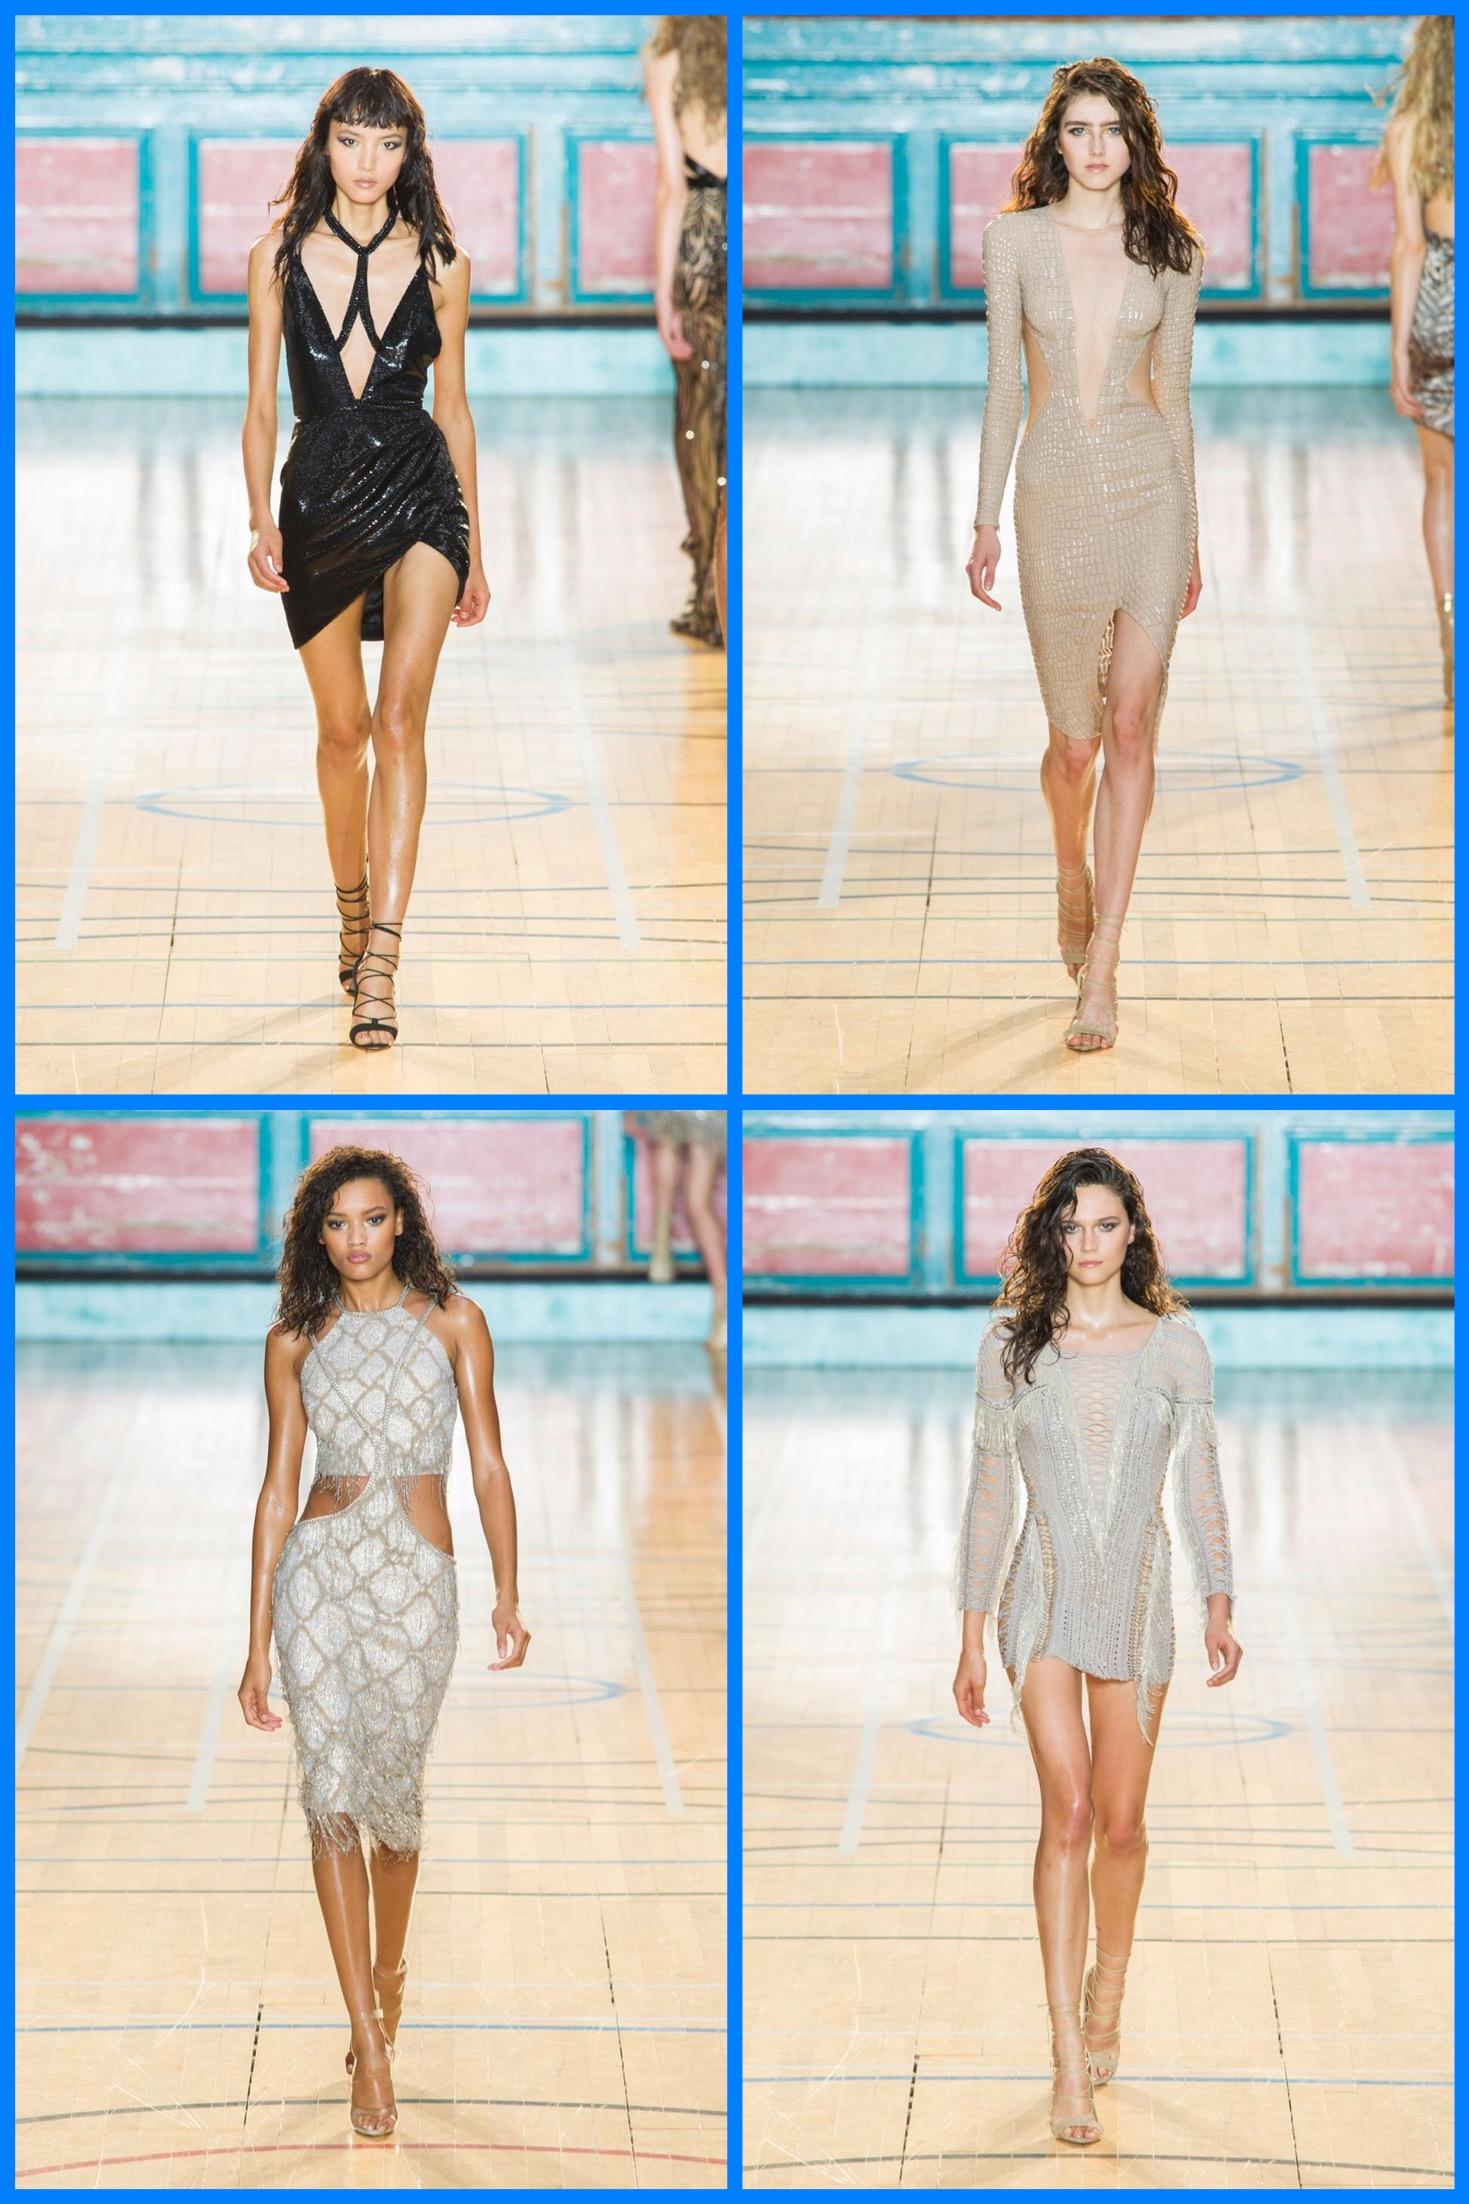 london-fashion-week-pret-a-porter-spring-summer-2017-style-julien-macdonald